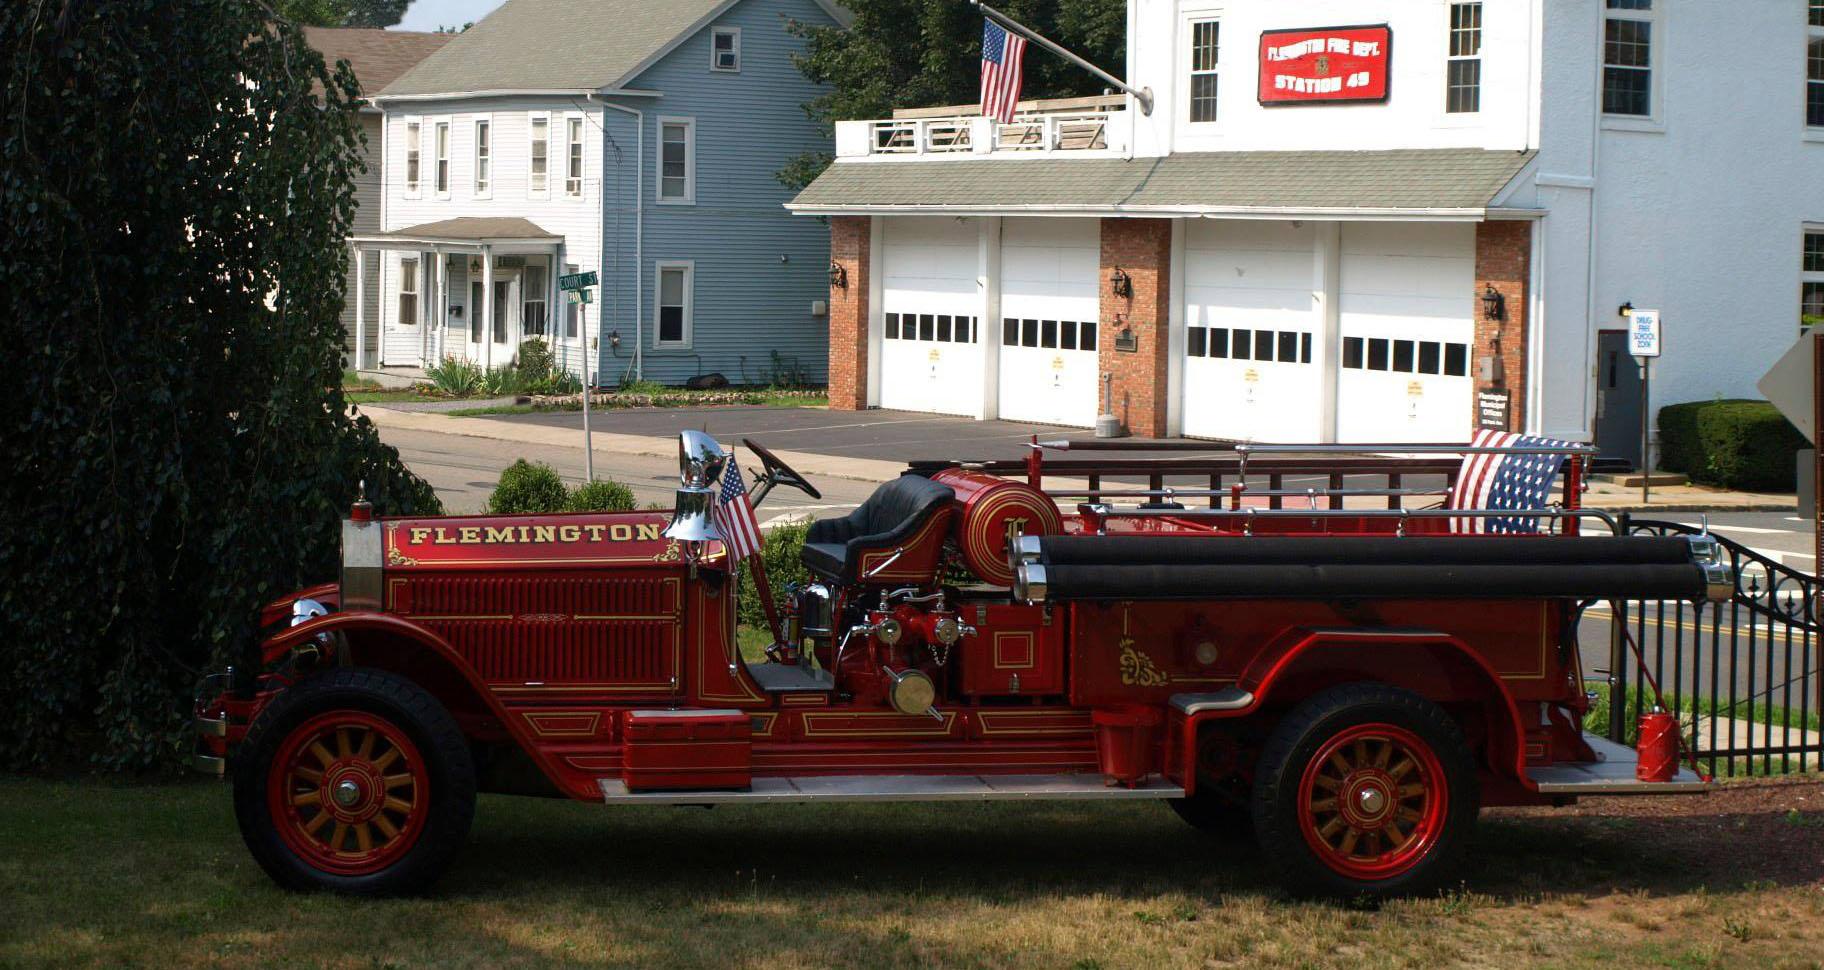 Flemington Fire Department | Flemington, NJ